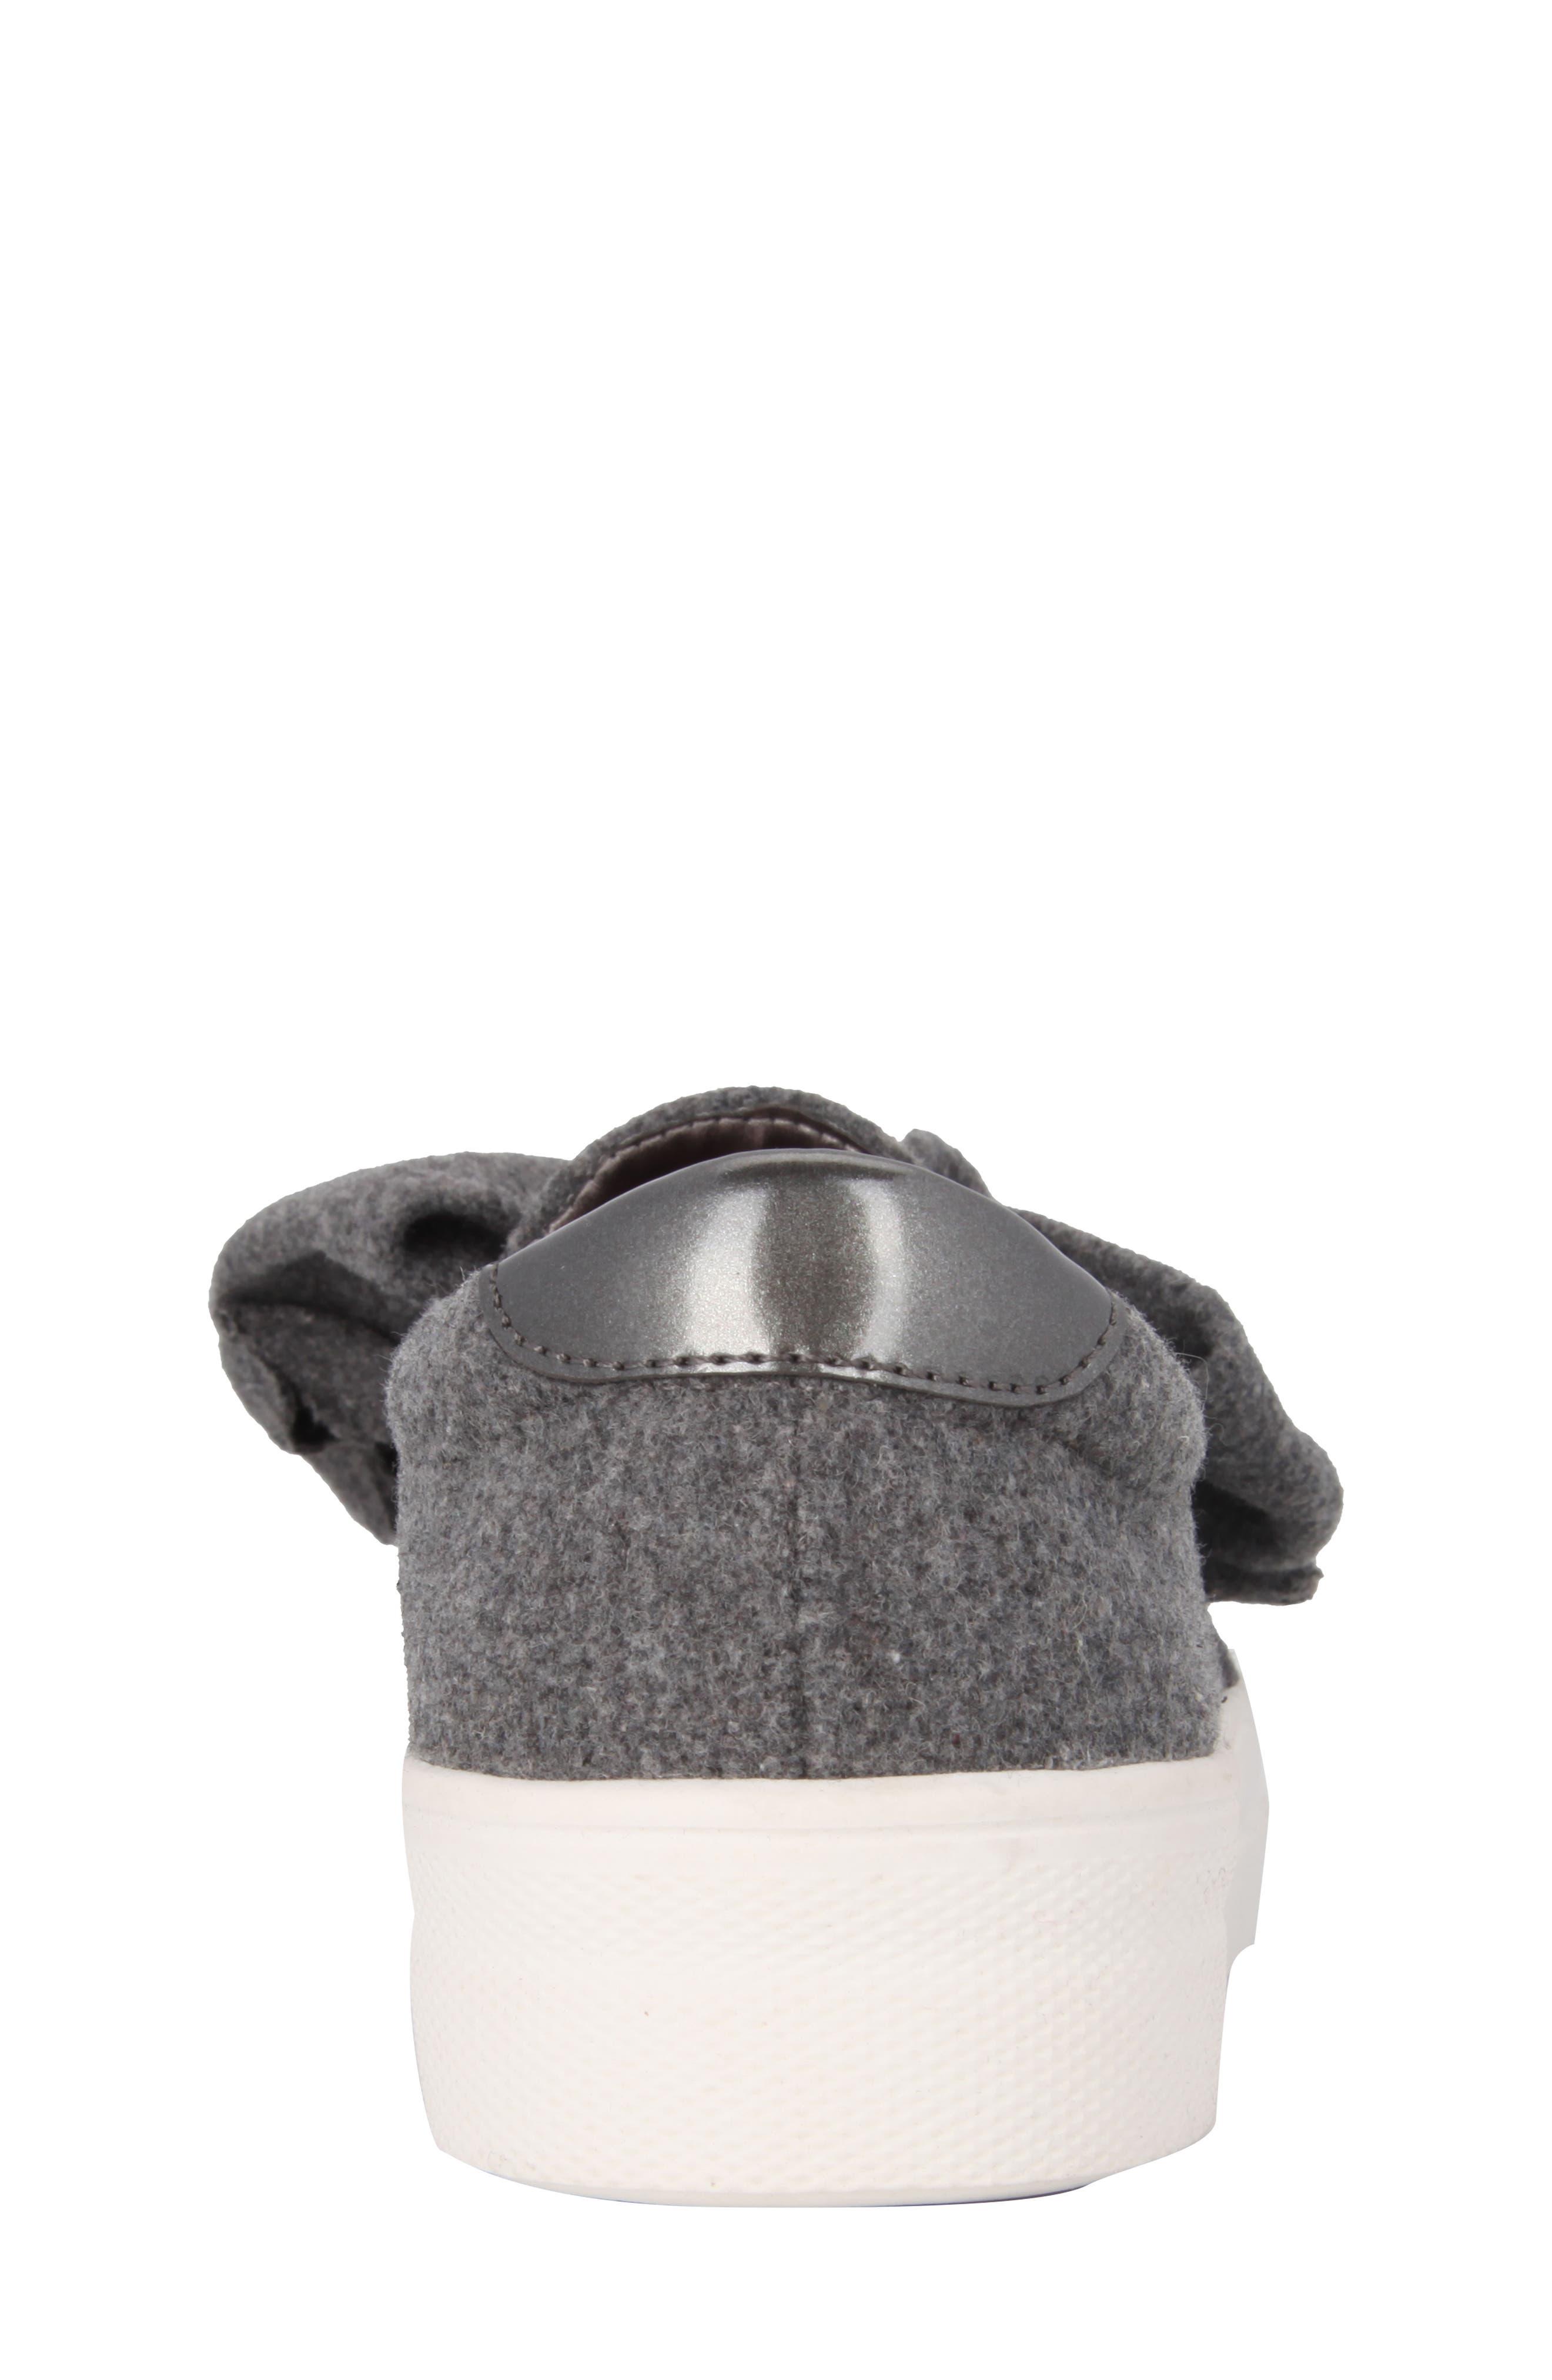 Vaneza Slip-On Bow Sneaker,                             Alternate thumbnail 7, color,                             Grey Flannel